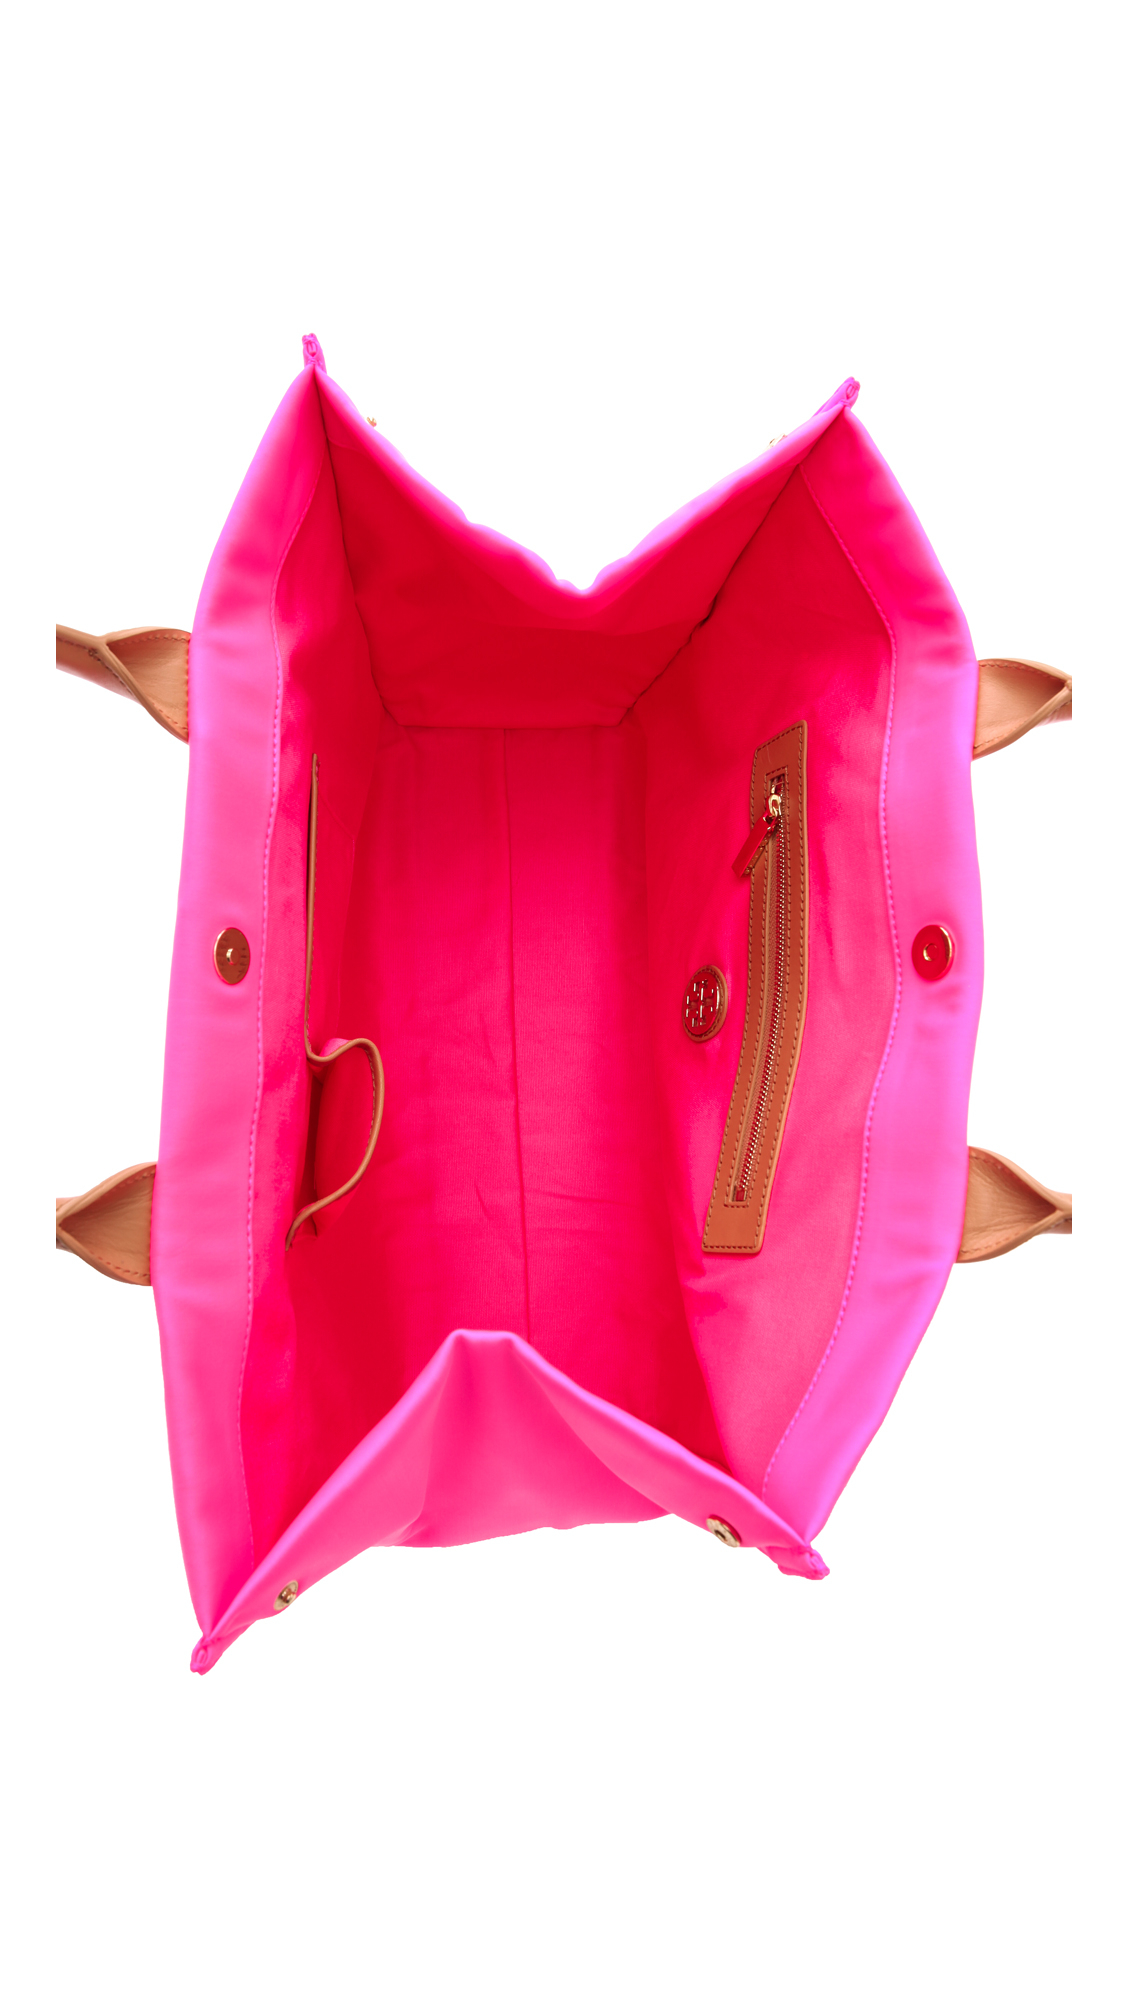 b48306e458c Lyst - Tory Burch Ella Neoprene Tote Green in Pink